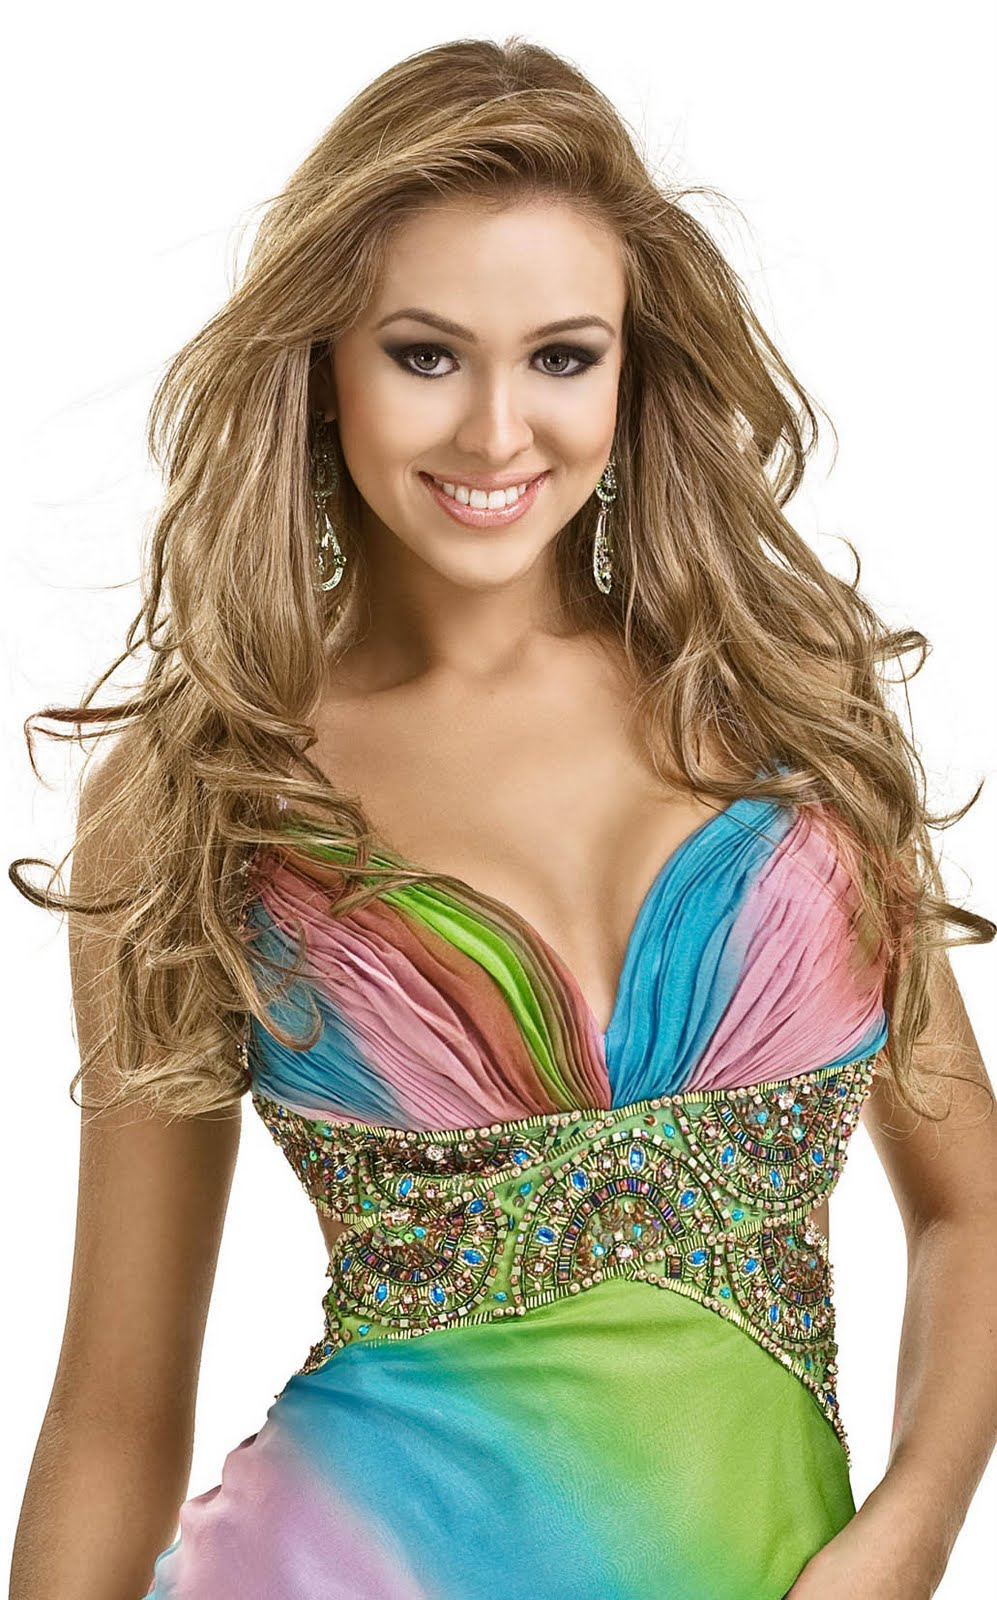 marylia bernardt, miss brasil continente americano 2010. - Página 2 E7umsx9f